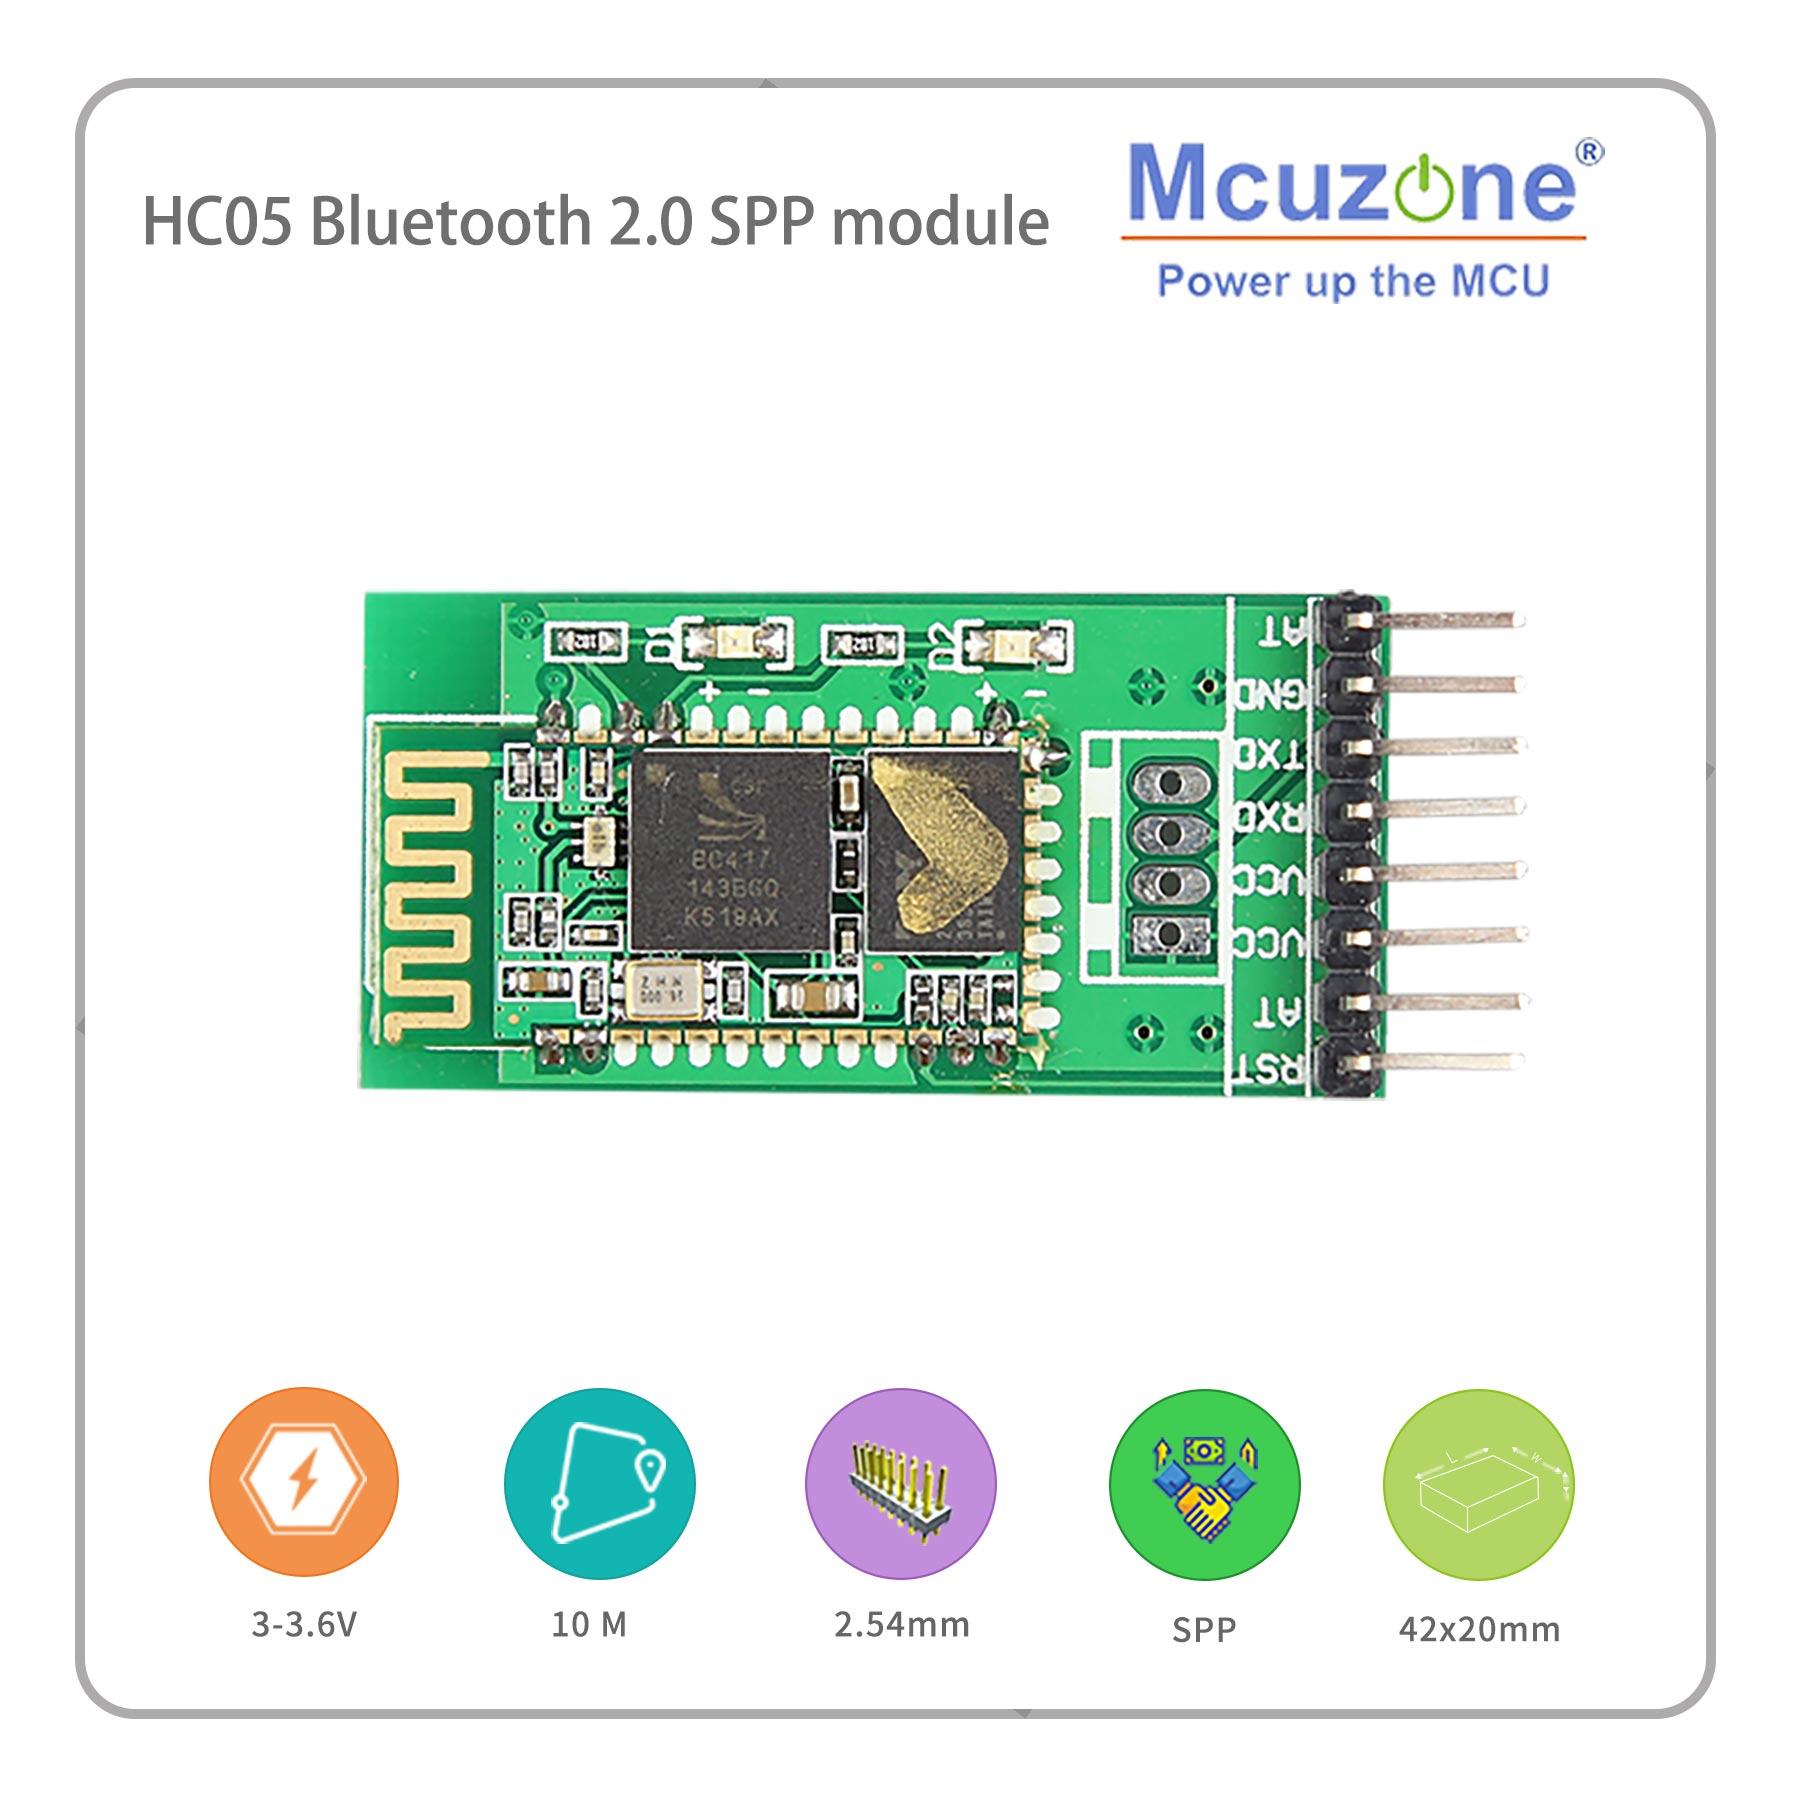 Mcuzone HC05 Bluetooth 2.0 BT SPP Module, For Arduino Linux MCU, Android App UART